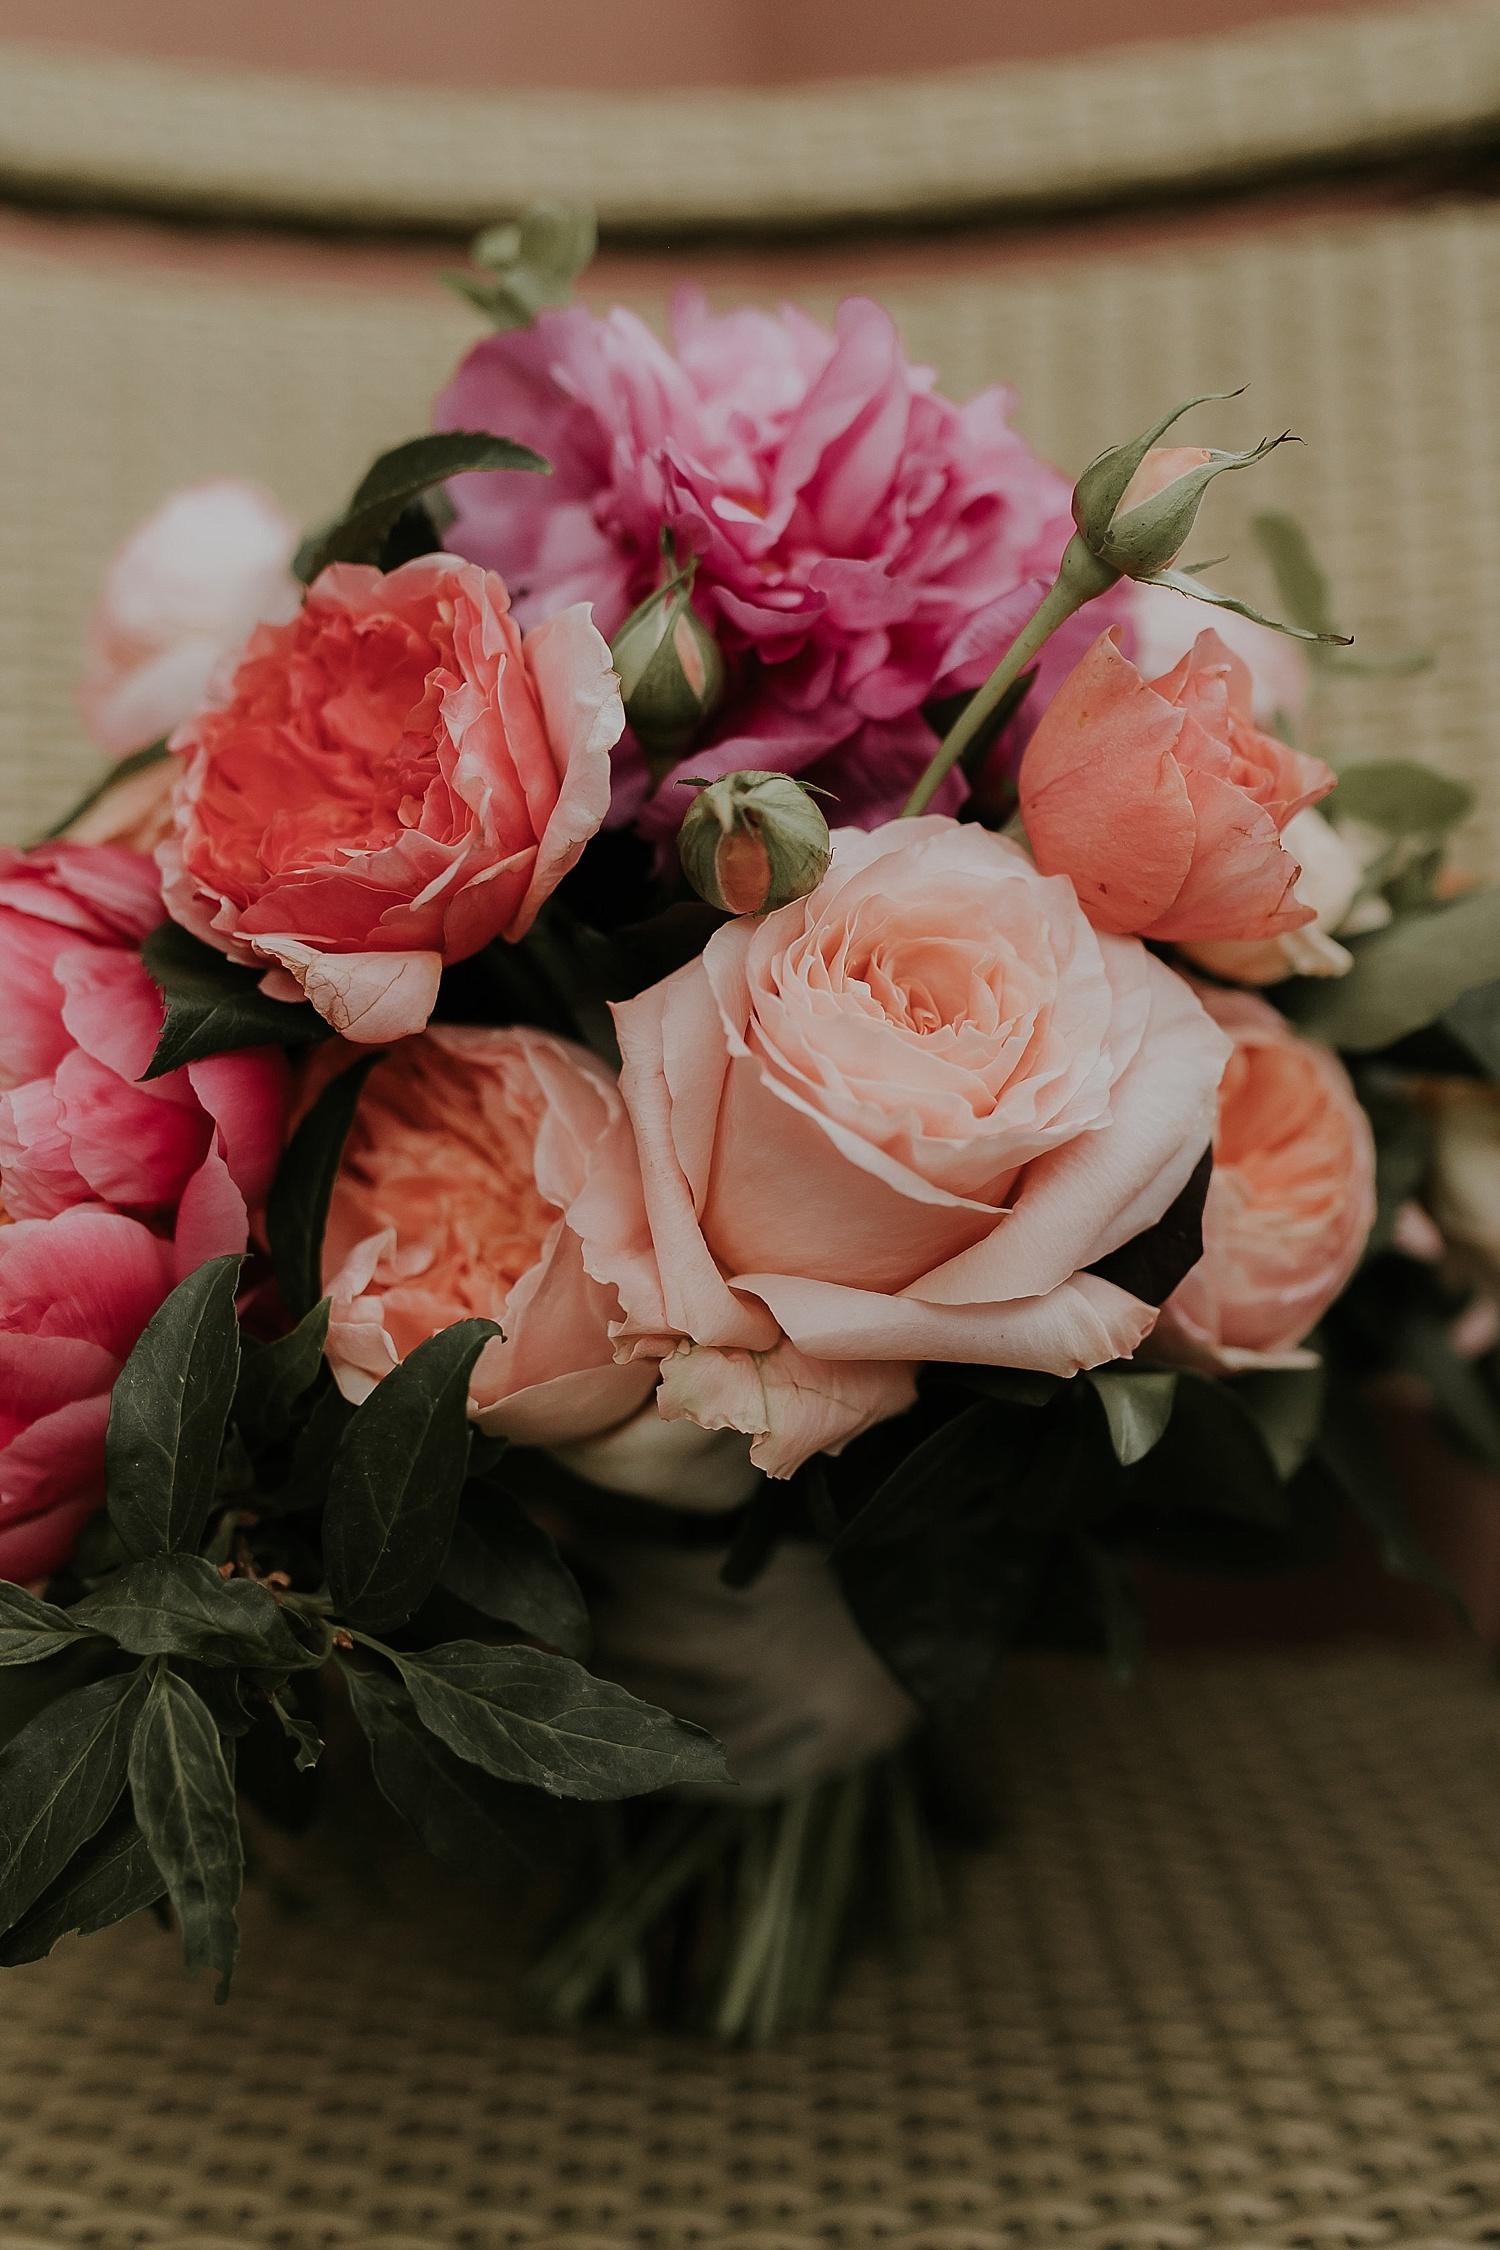 Alicia+lucia+photography+-+albuquerque+wedding+photographer+-+santa+fe+wedding+photography+-+new+mexico+wedding+photographer+-+gerald+peters+gallery+wedding_0007.jpg